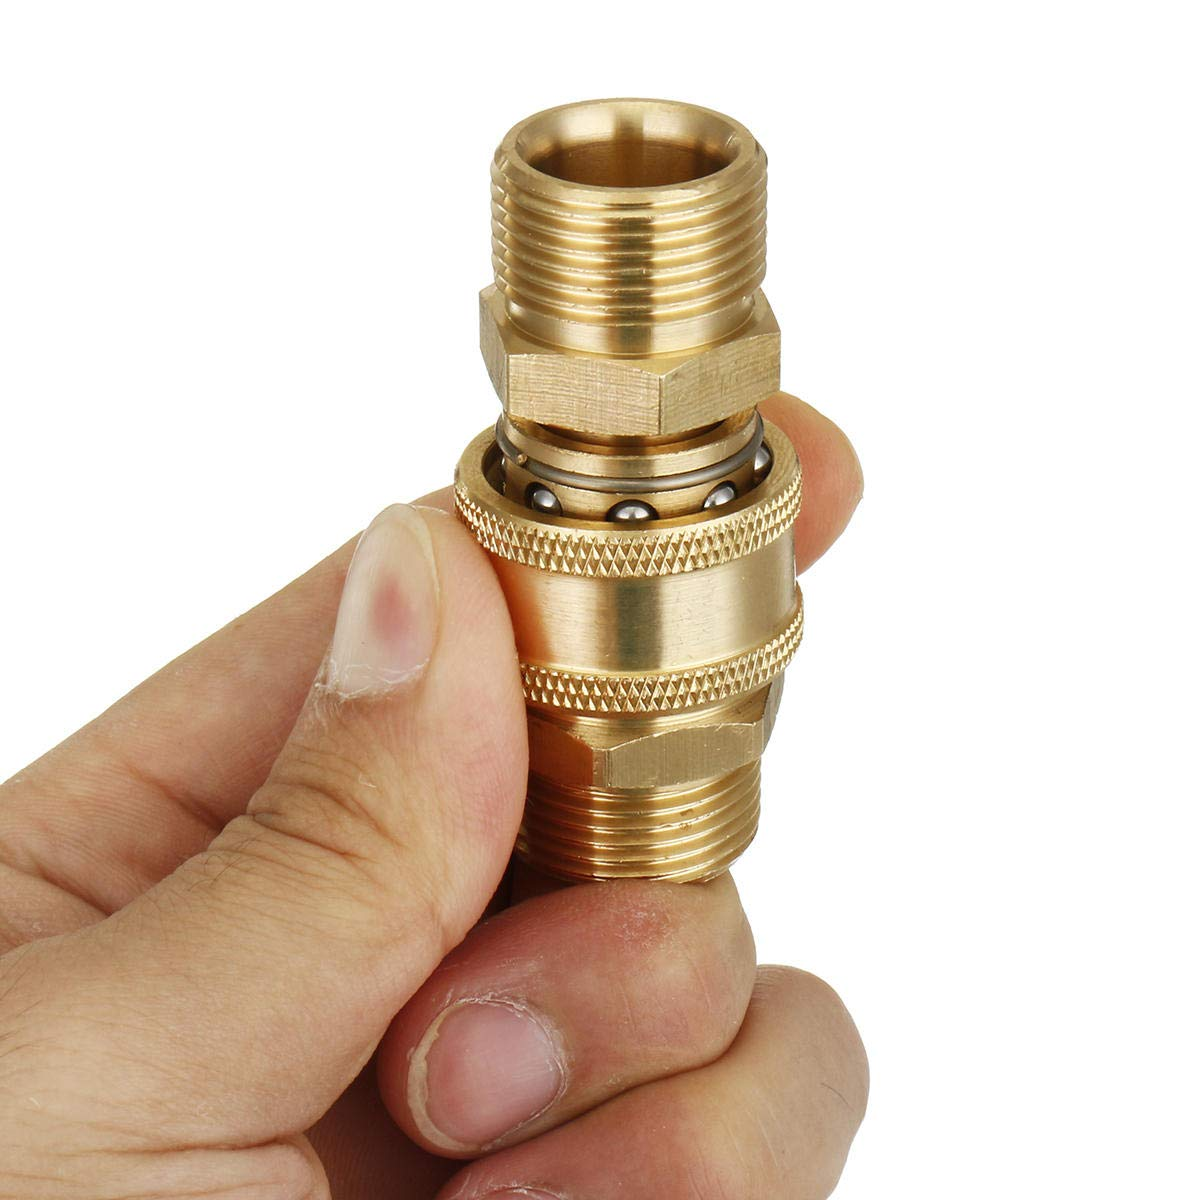 3 piezas M22 a 3//8 Quick-Connect tuber/ías de lavadora de presi/ón de acoplamiento de manguera